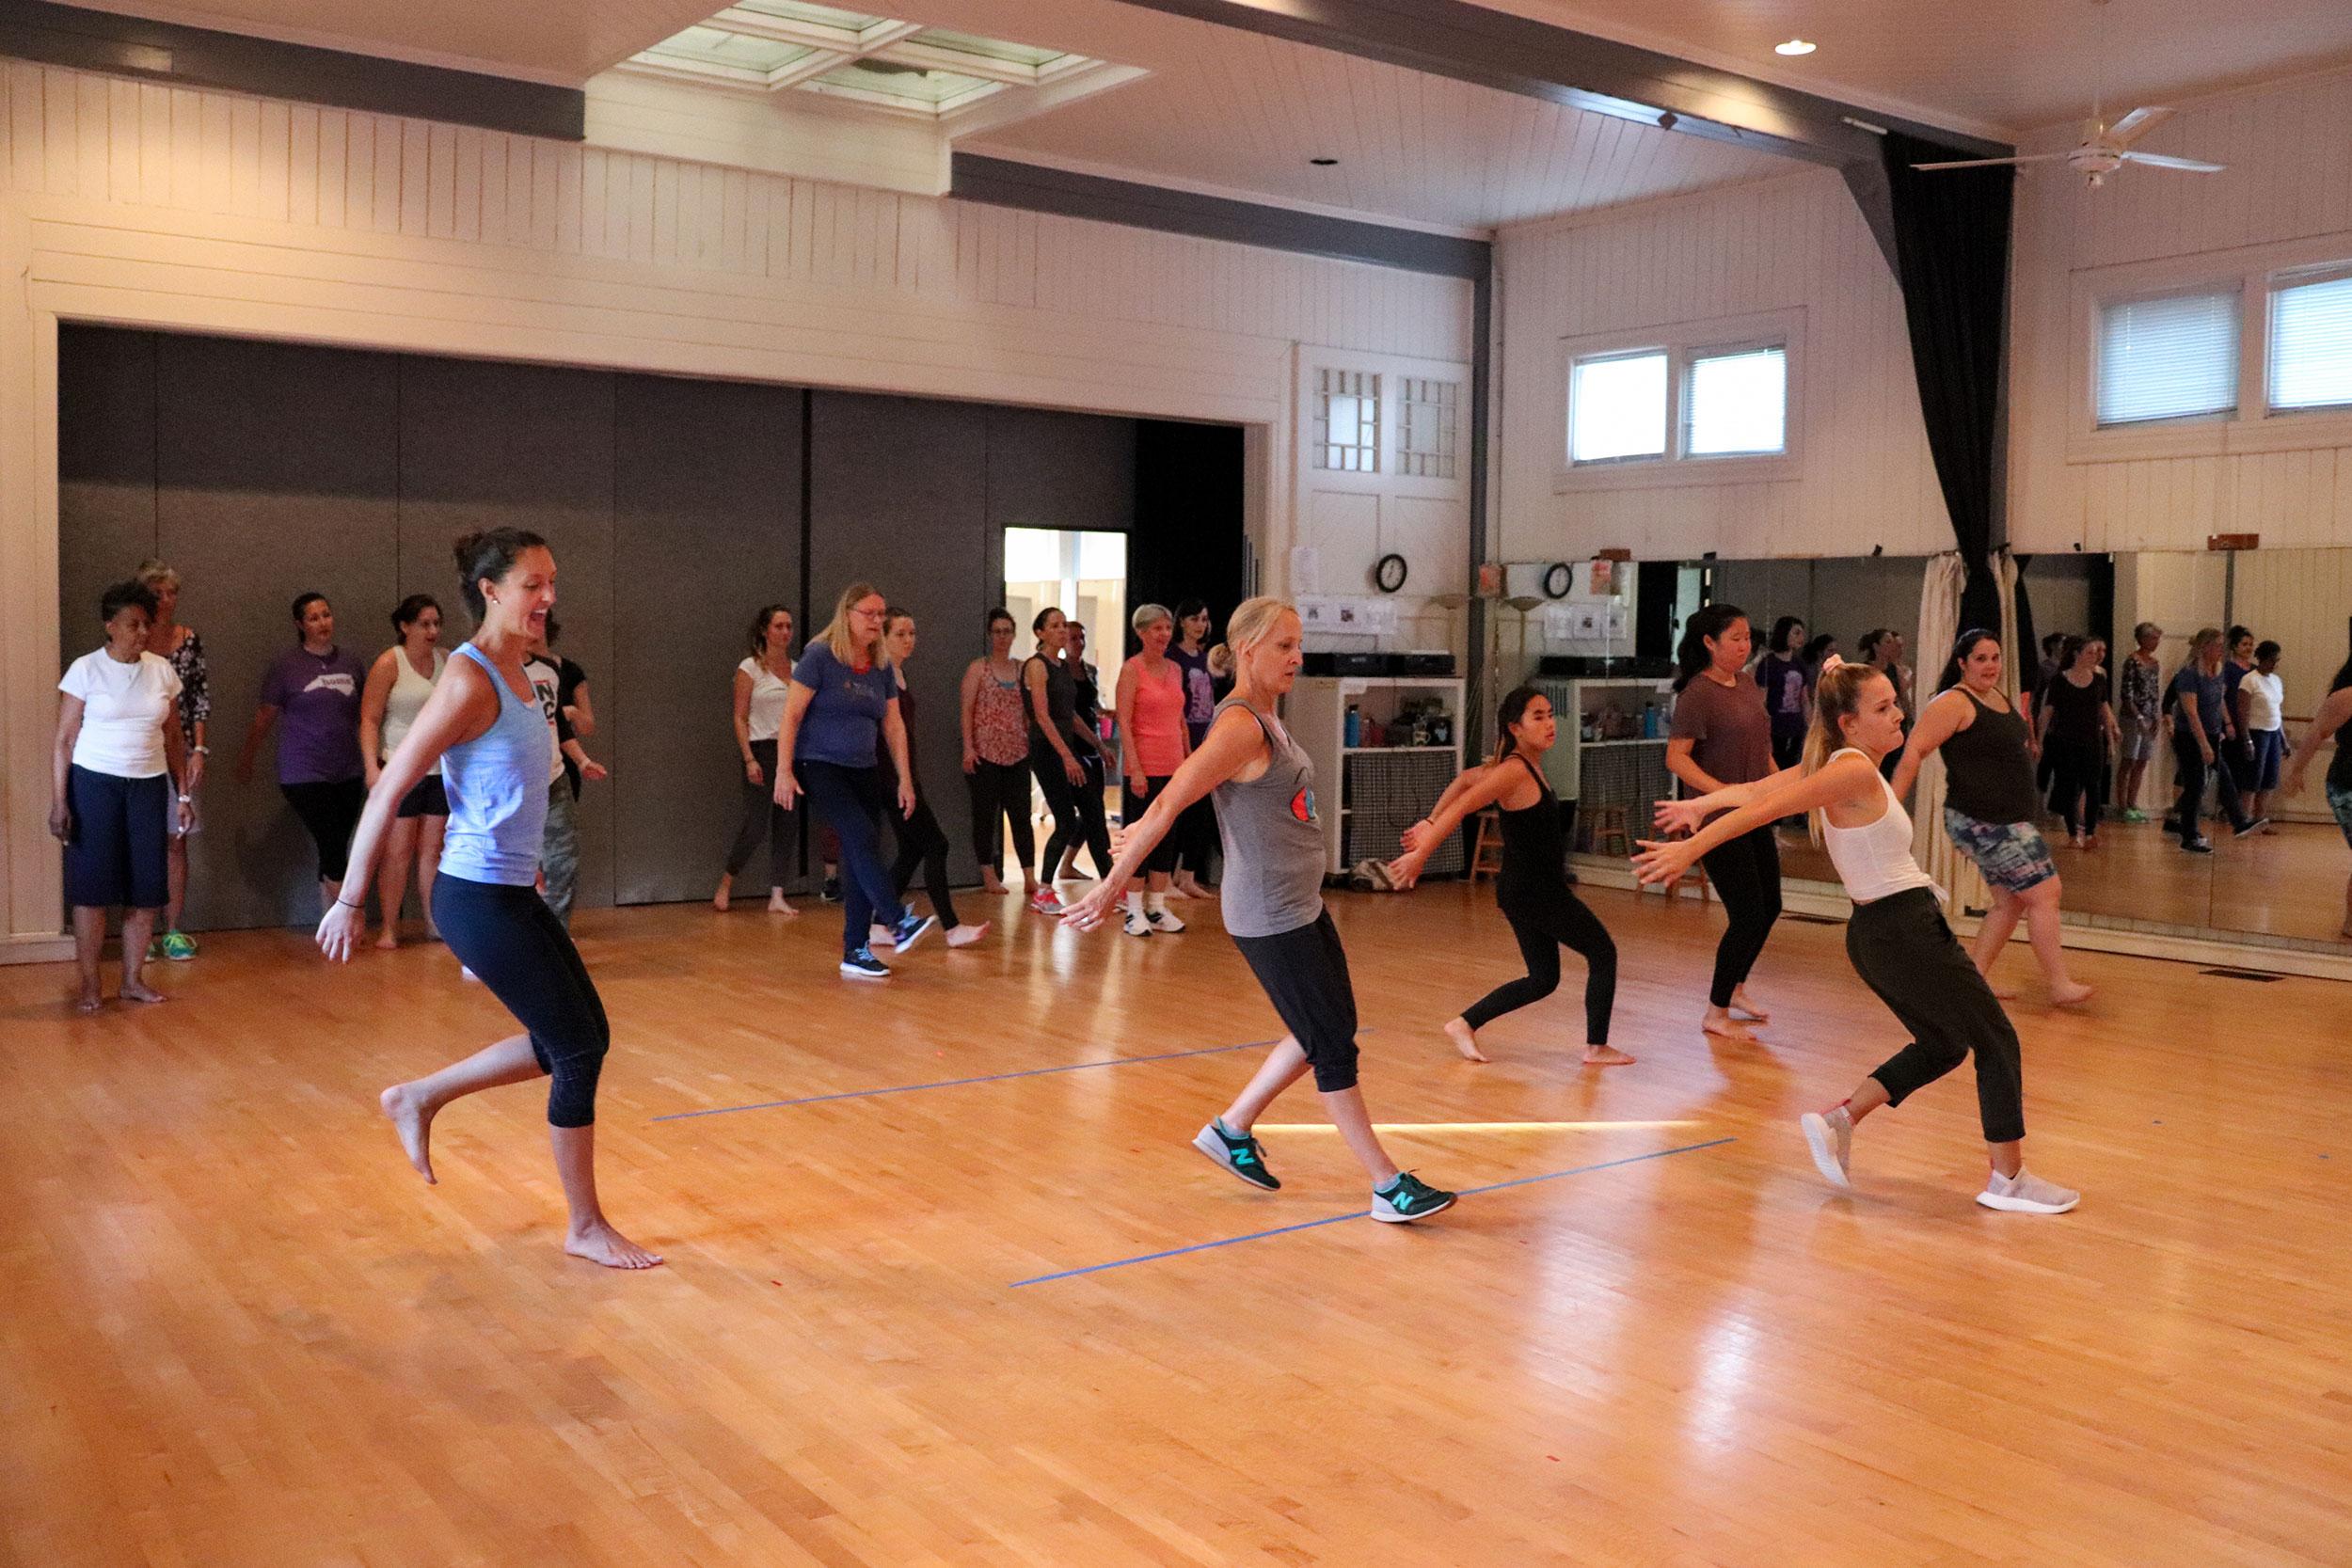 Adult students practice hip hop dance moves in a line across the dance floor.